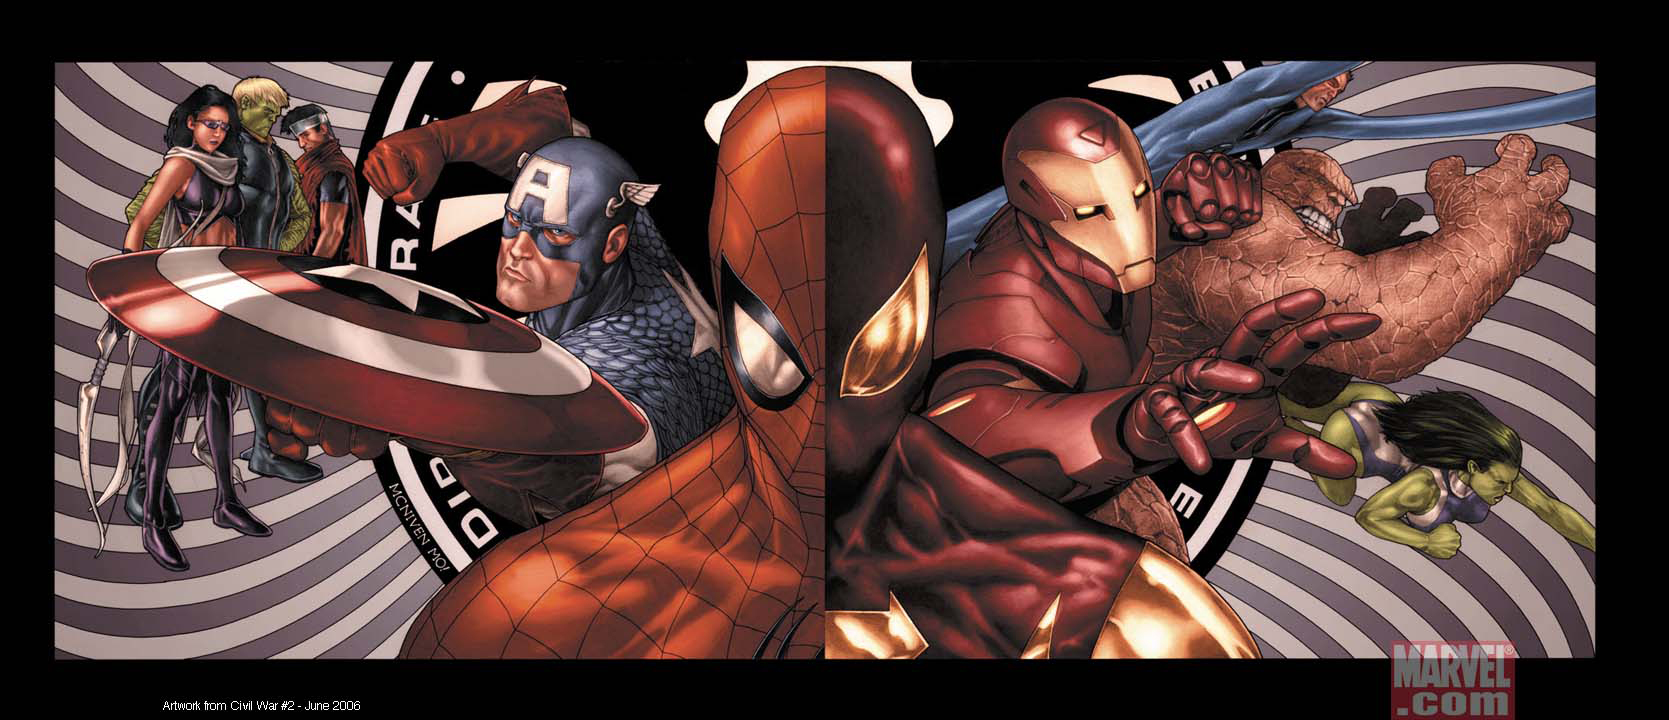 The Big Spider Man Theories Marvel Movie Magic 1669x720